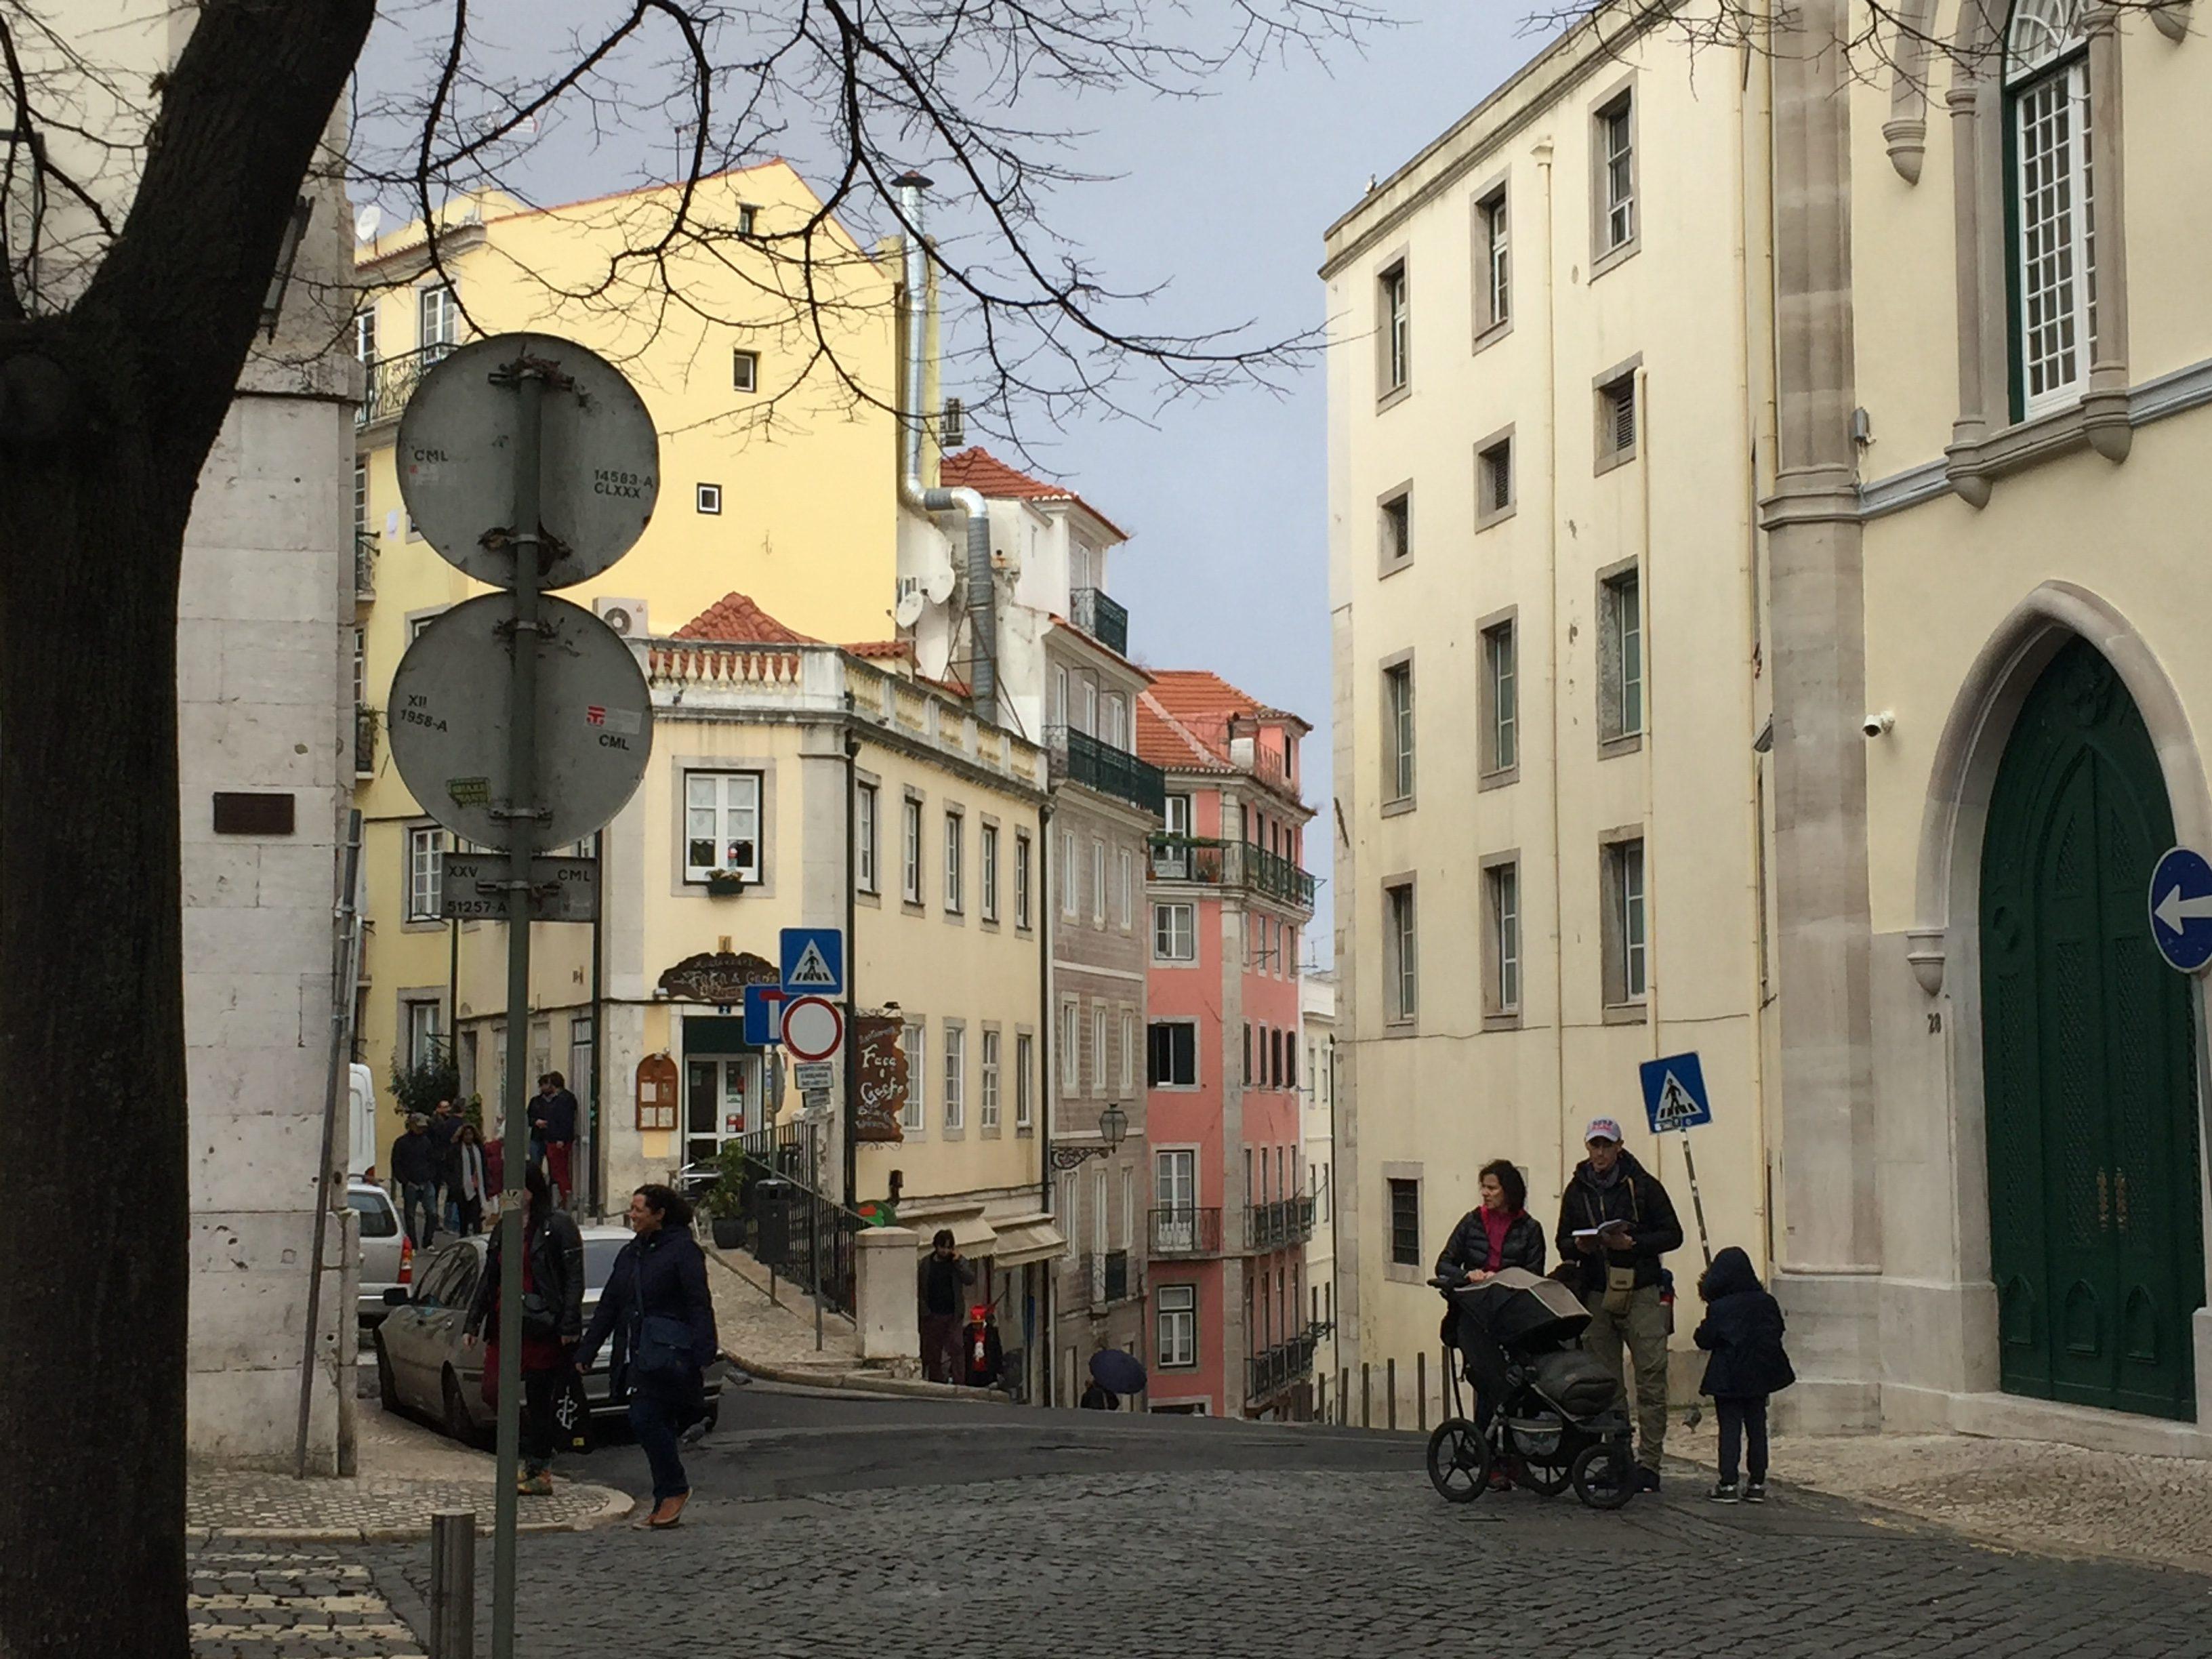 IMG 23081 e1515637266403 - Lugares para visitar en Lisboa (Parte II/II)